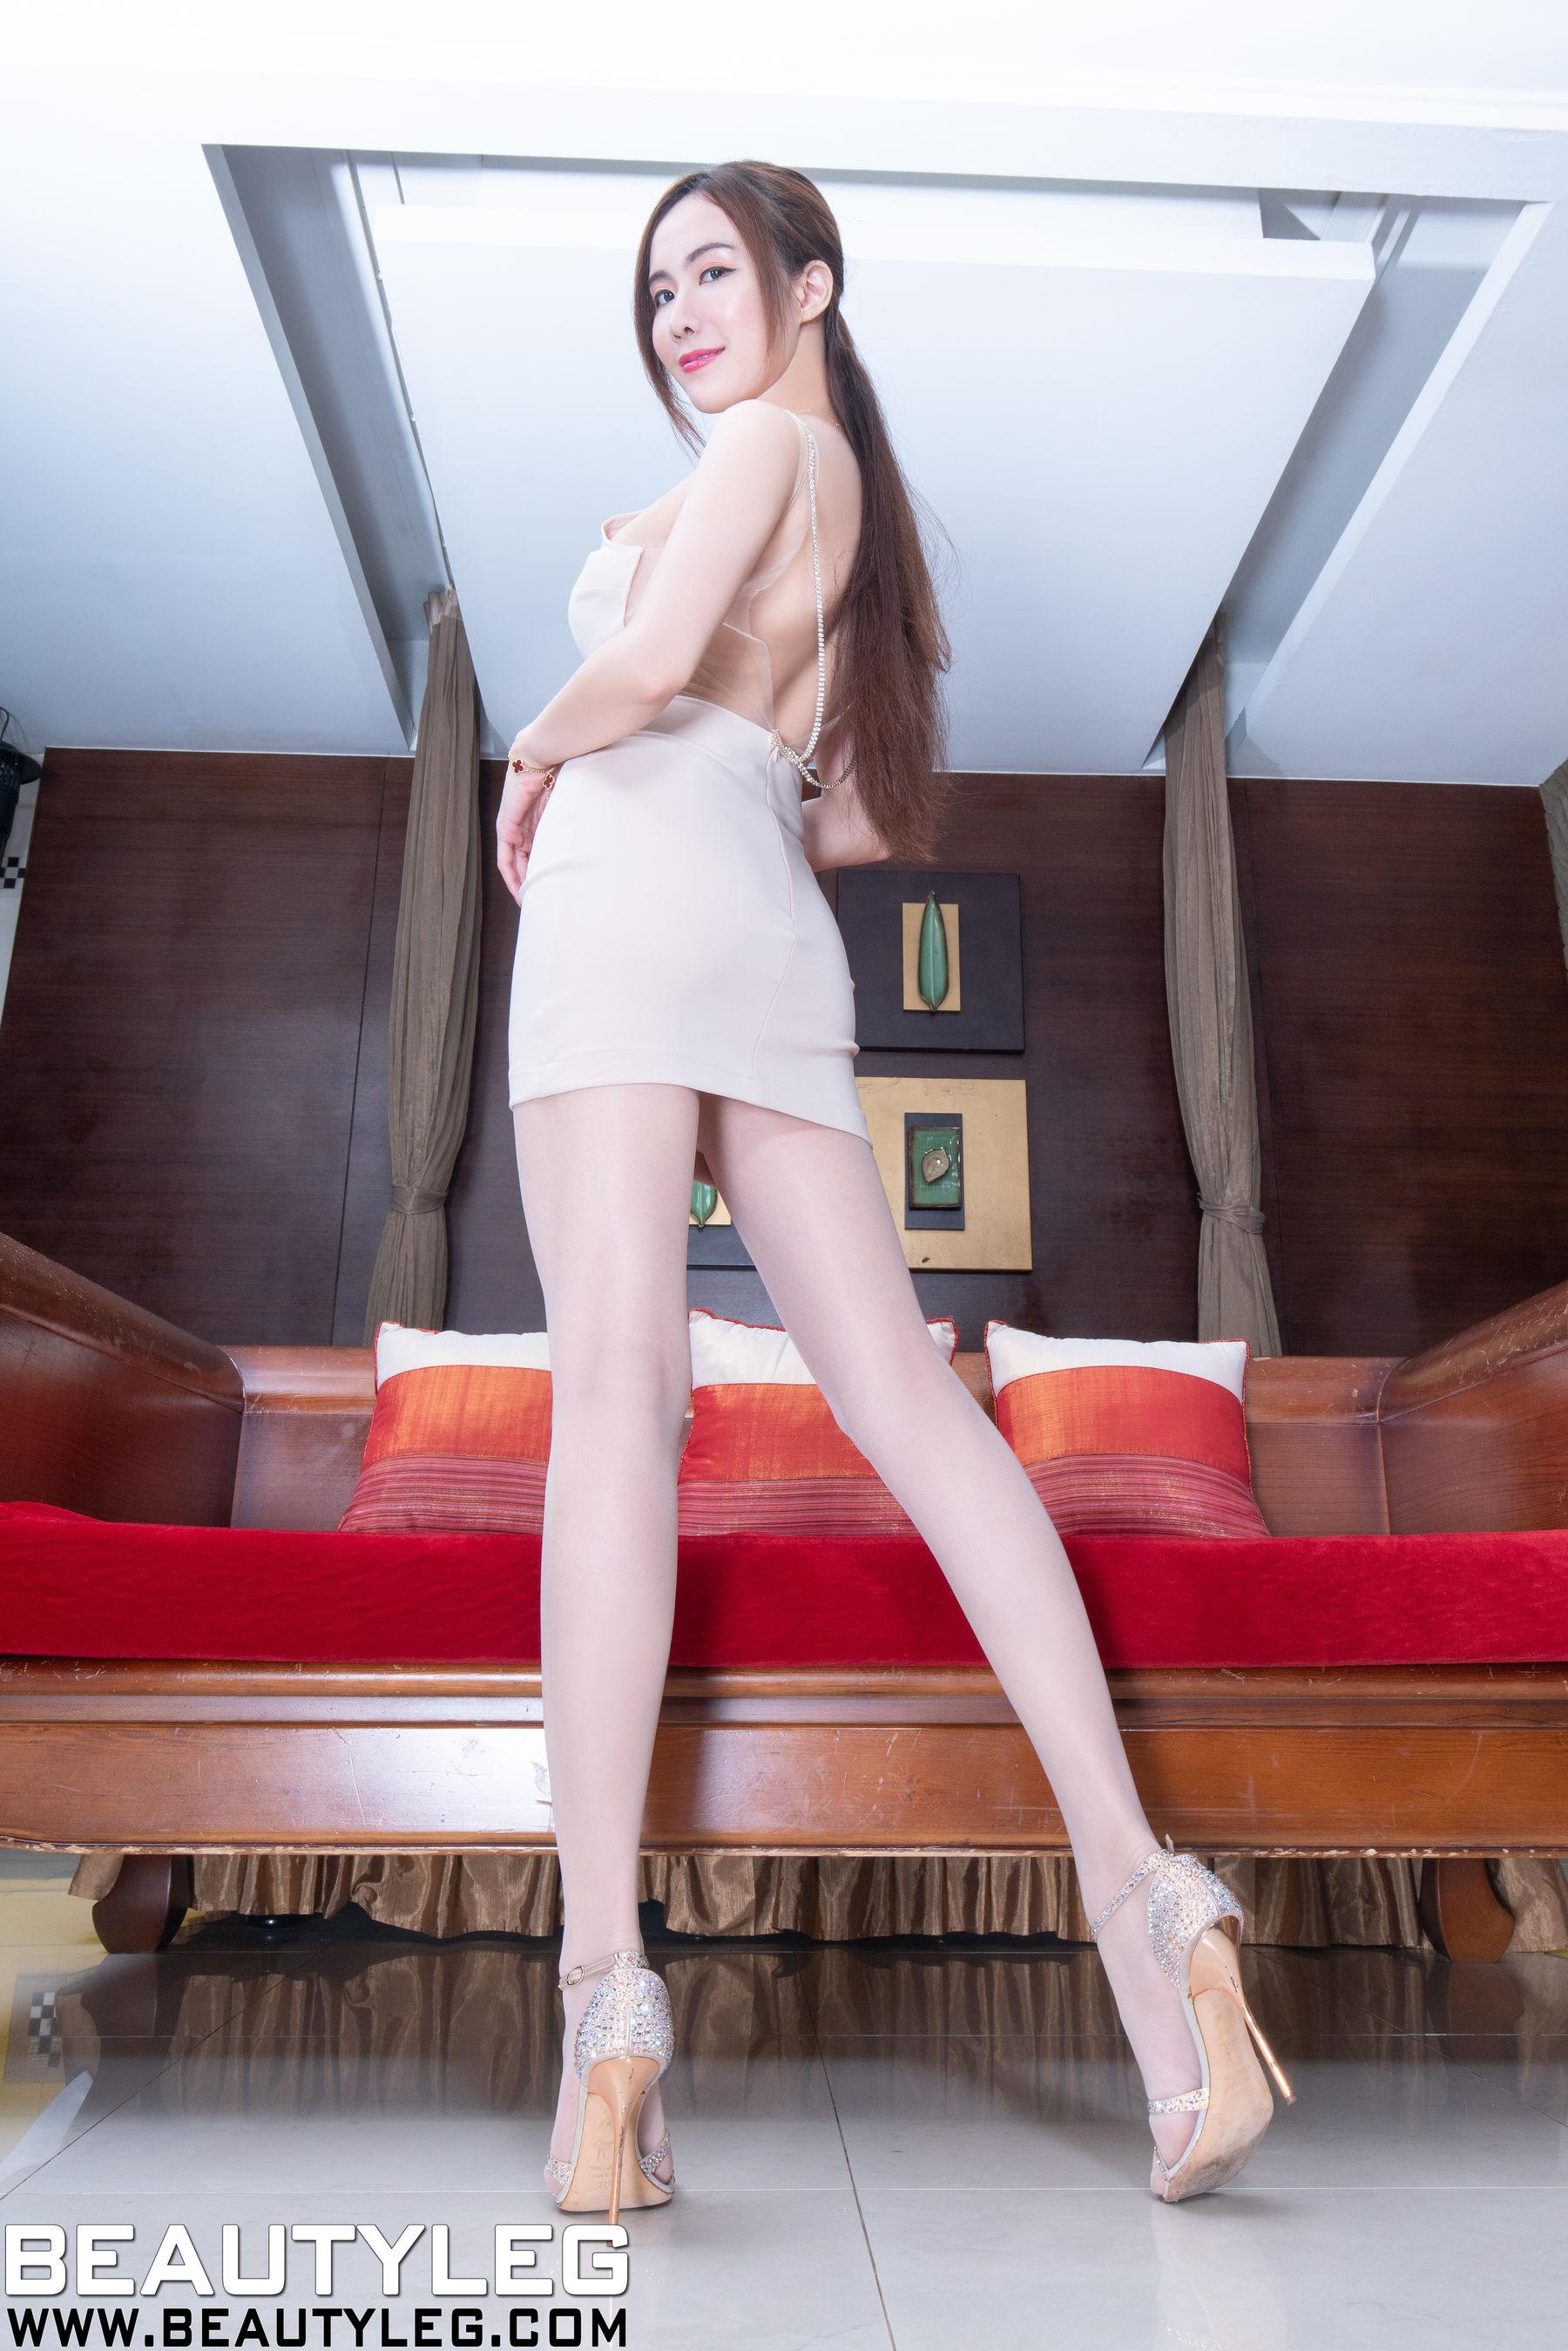 VOL.1968 [Beautyleg]丝袜美腿长腿美女:曾妍希(腿模Dora)超高清个人性感漂亮大图(52P)